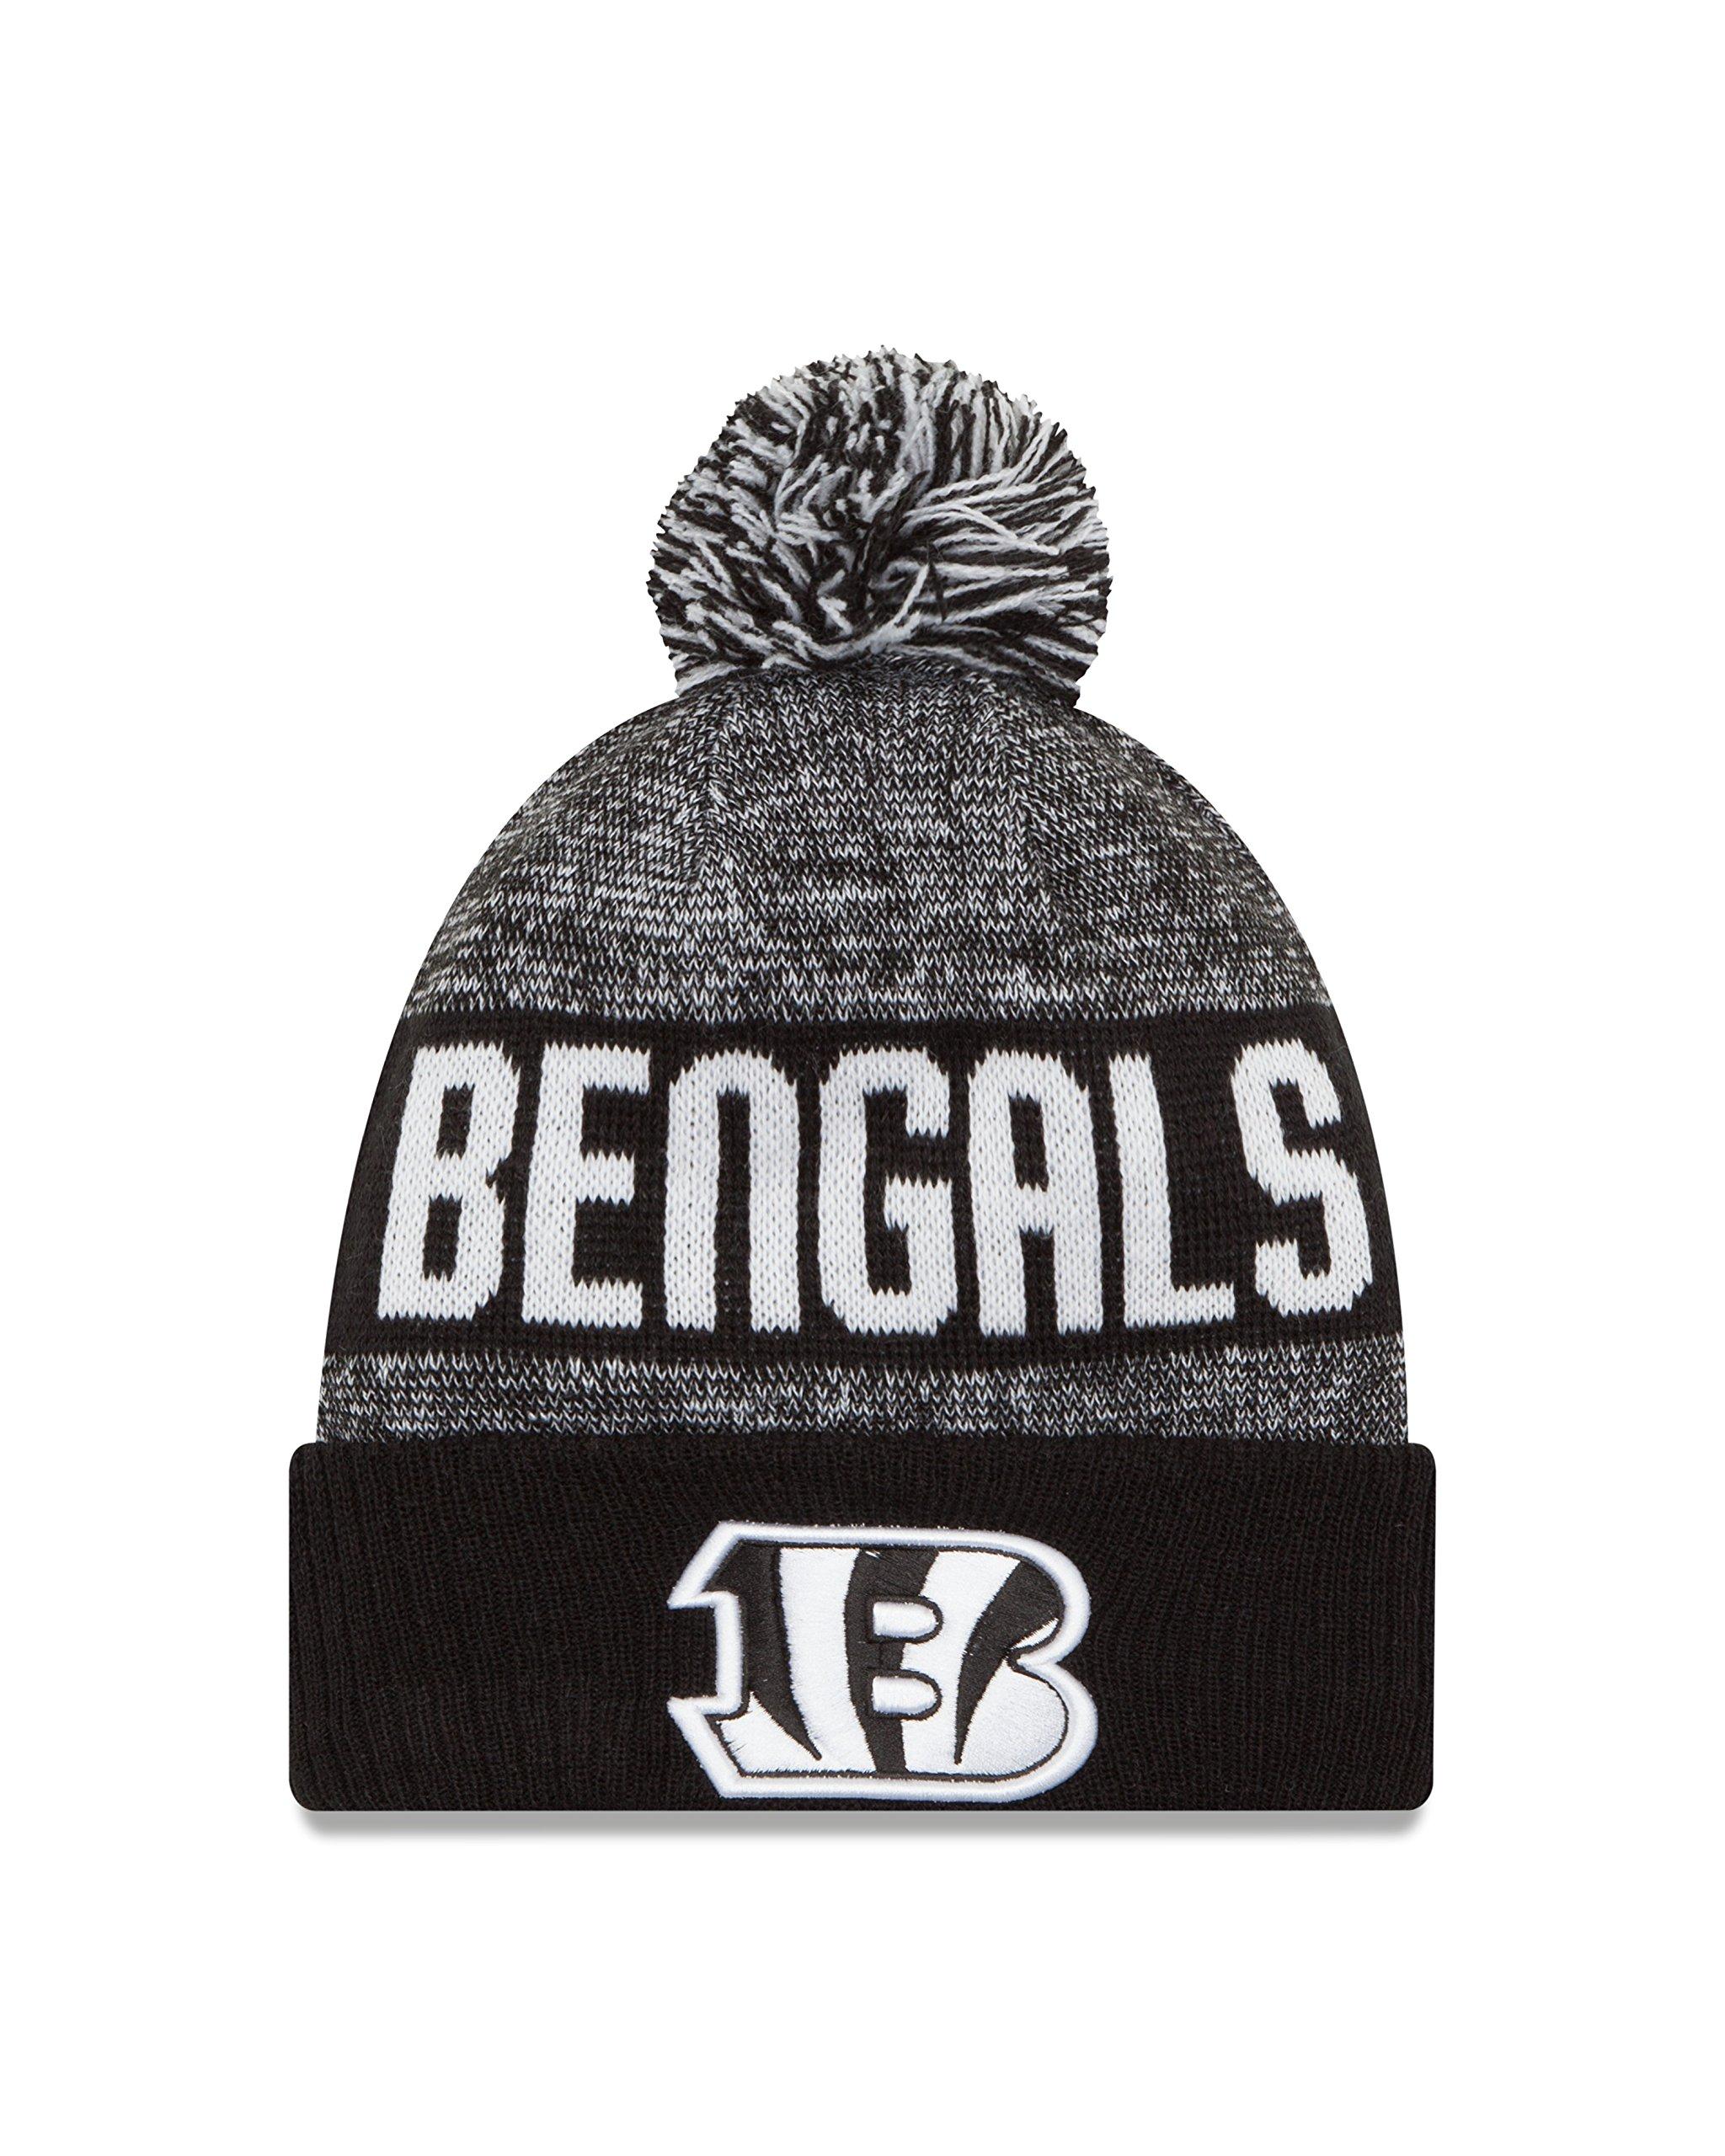 New Era NFL Cincinnati Bengals 2016 Sport Knit Beanie, One Size, Black/White